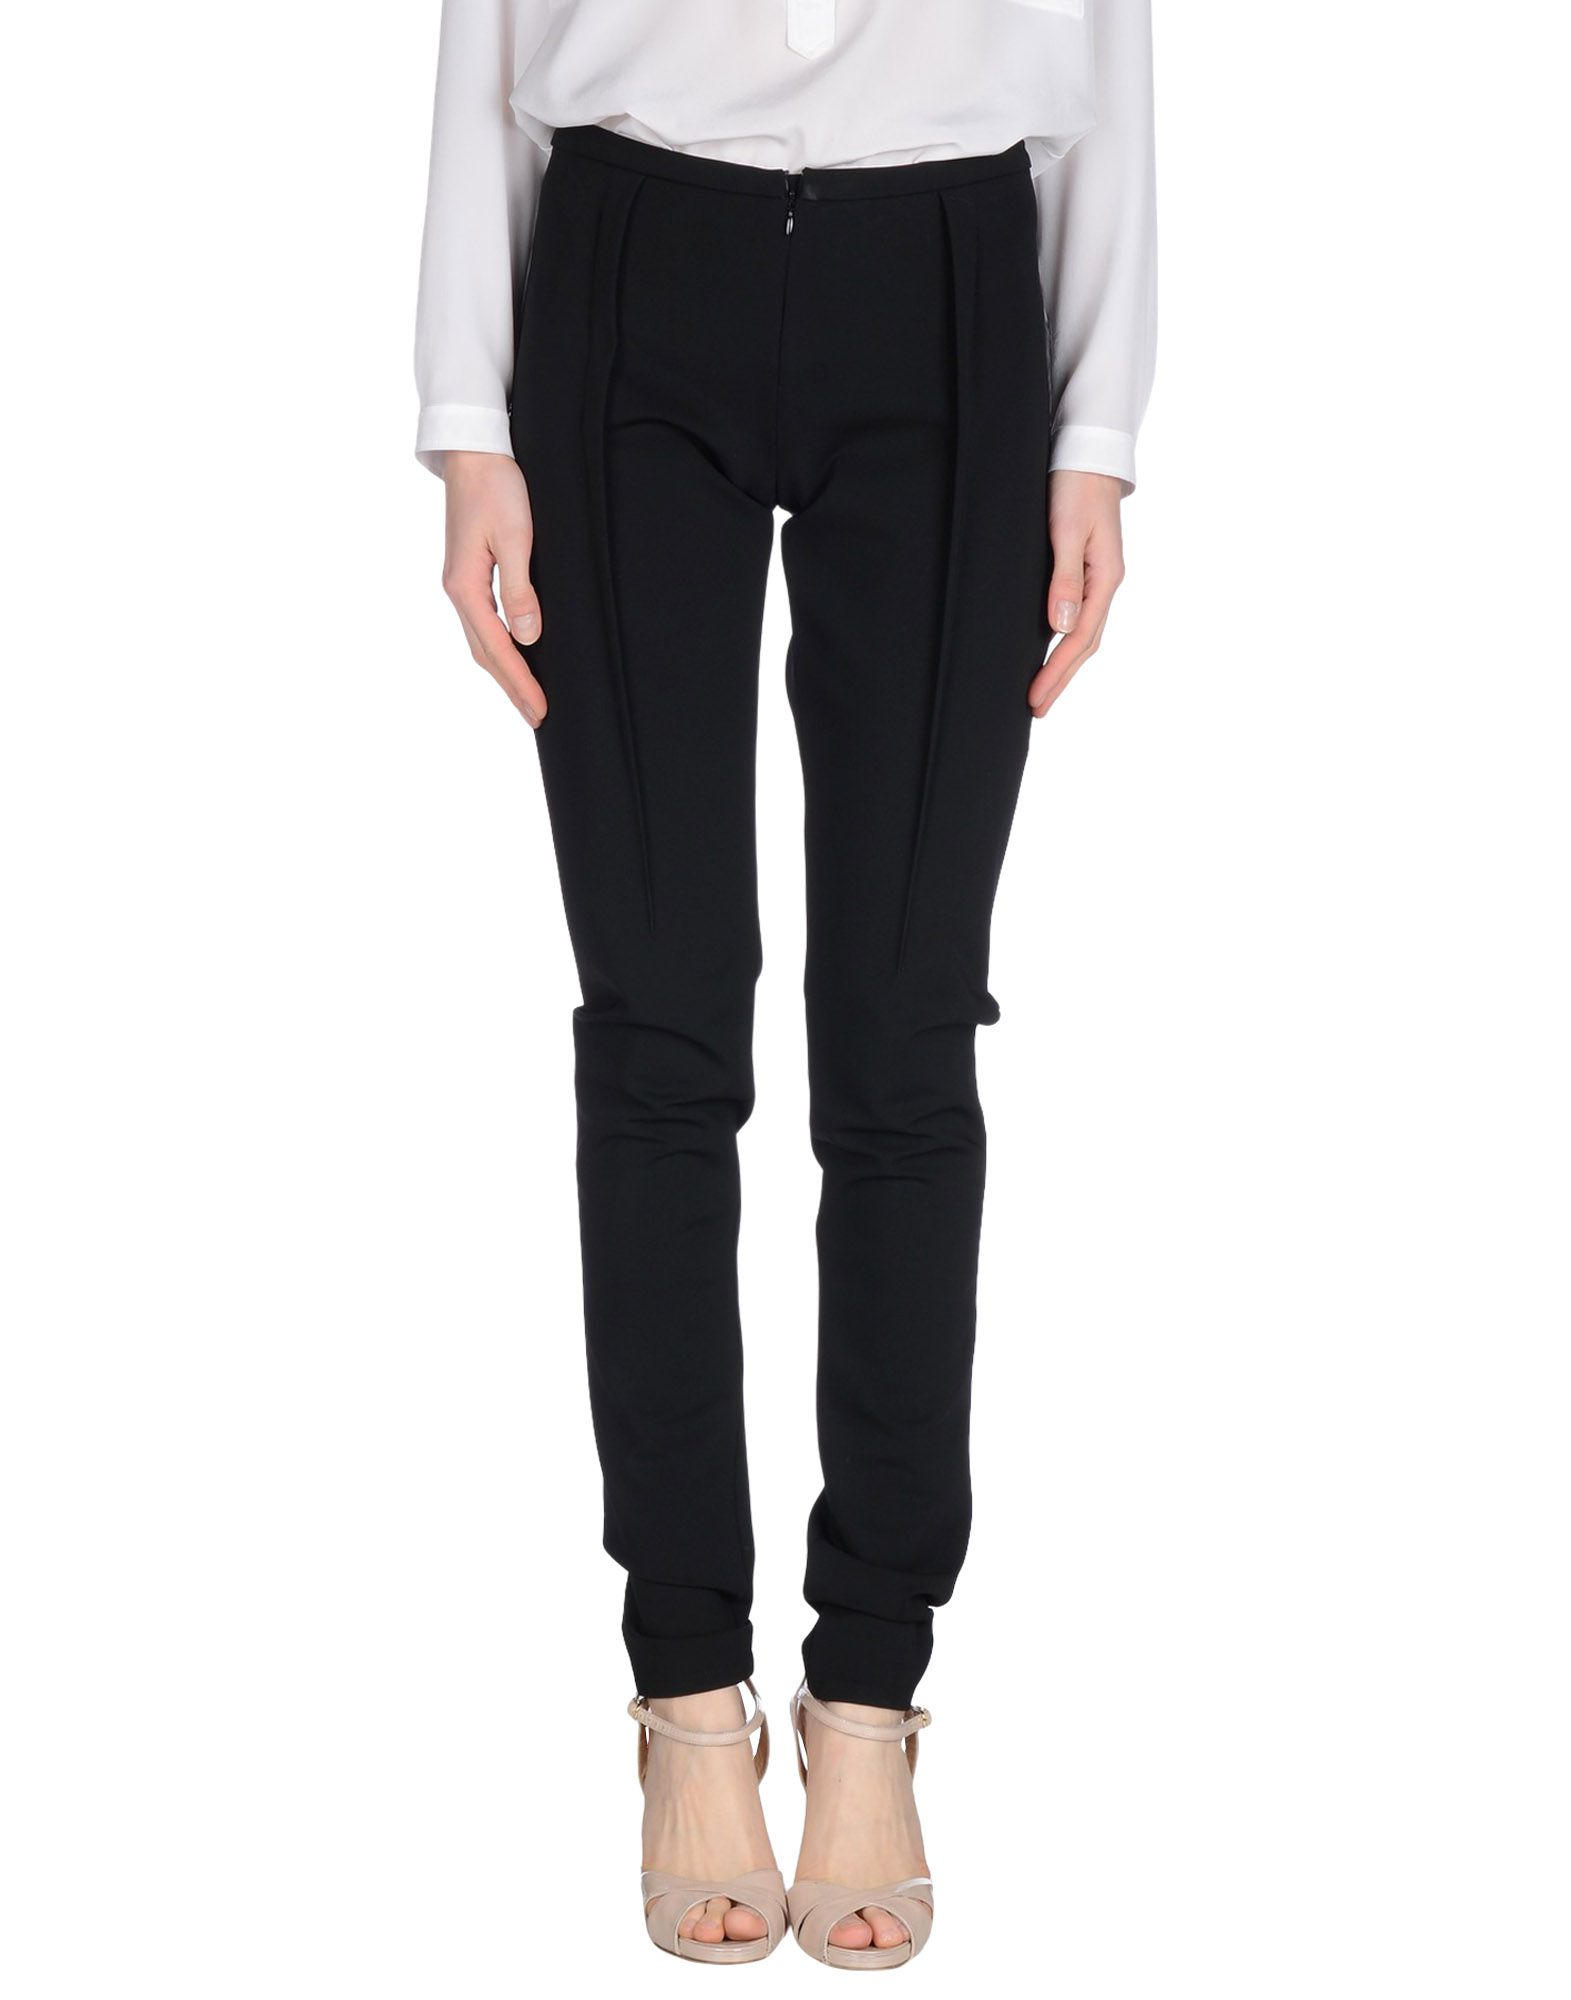 LUTZ HUELLE Casual Pants in Black